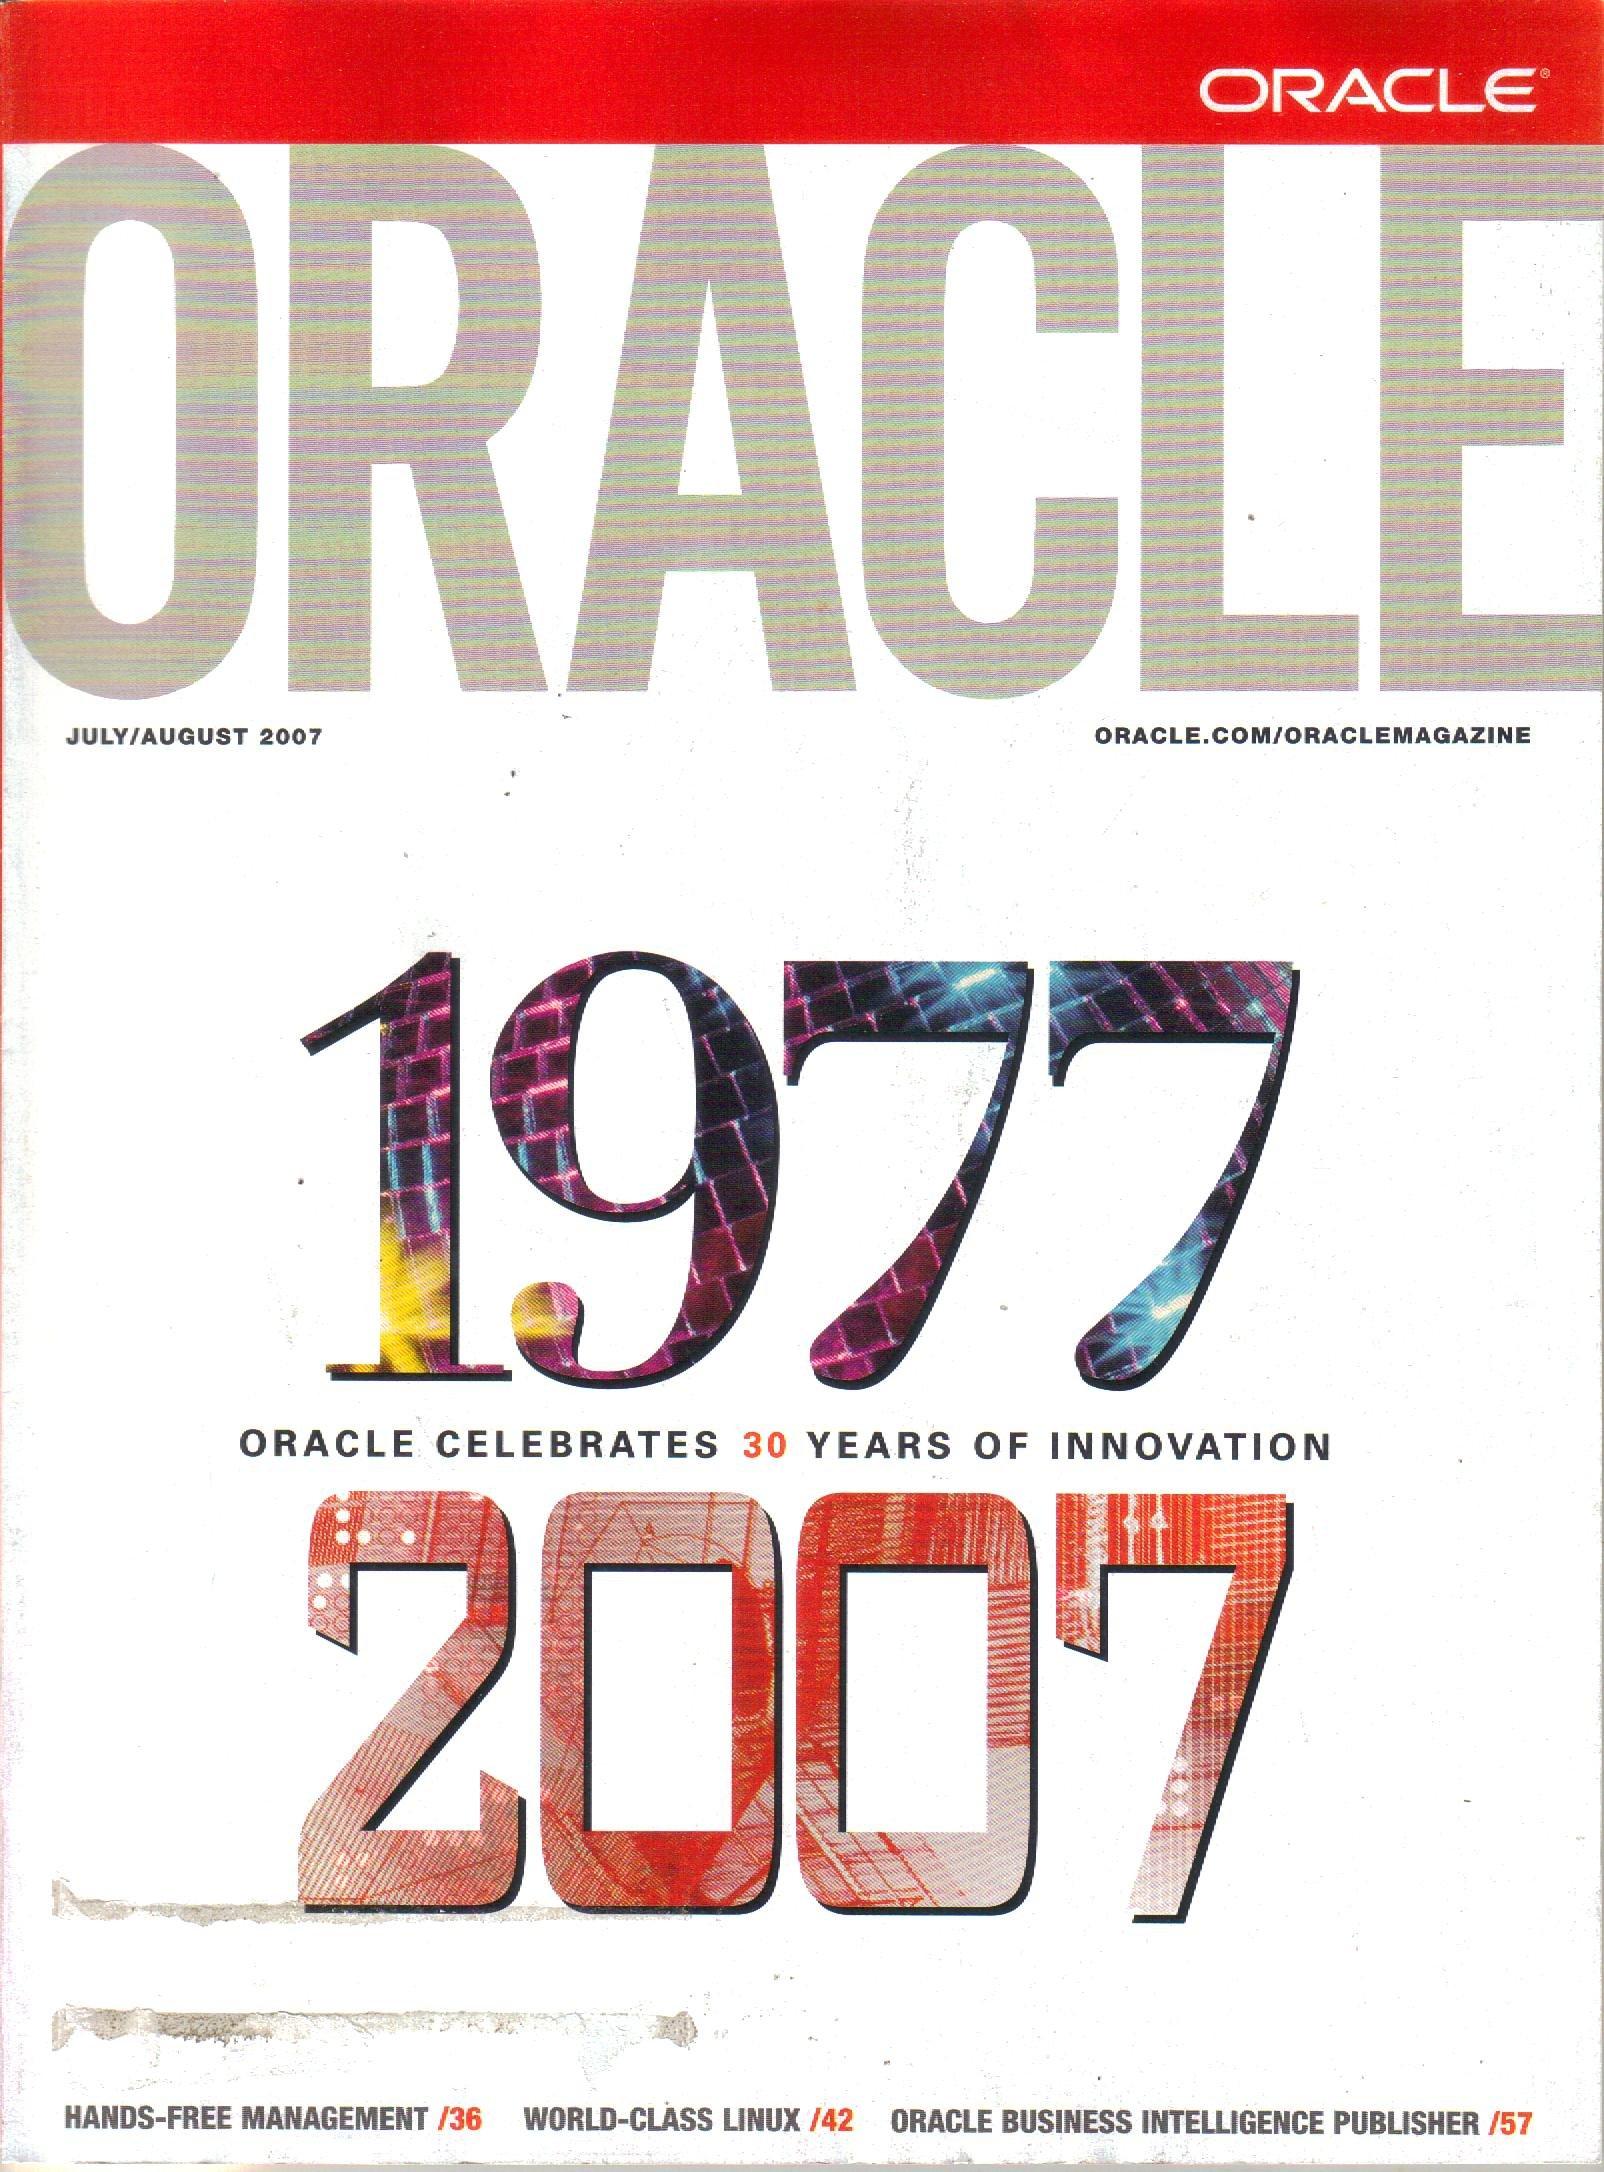 Oracle Magazine, July - August 2007 (Vol. 21, Issue 4): Tom Haunert, David  Baum, David A Kelley, Dr John Quackenbush, Dana Farber, Jesper Andersen,  Christo Kutrovsky, Thomas Kurian, MK Rizwan, Lucas Jellema,